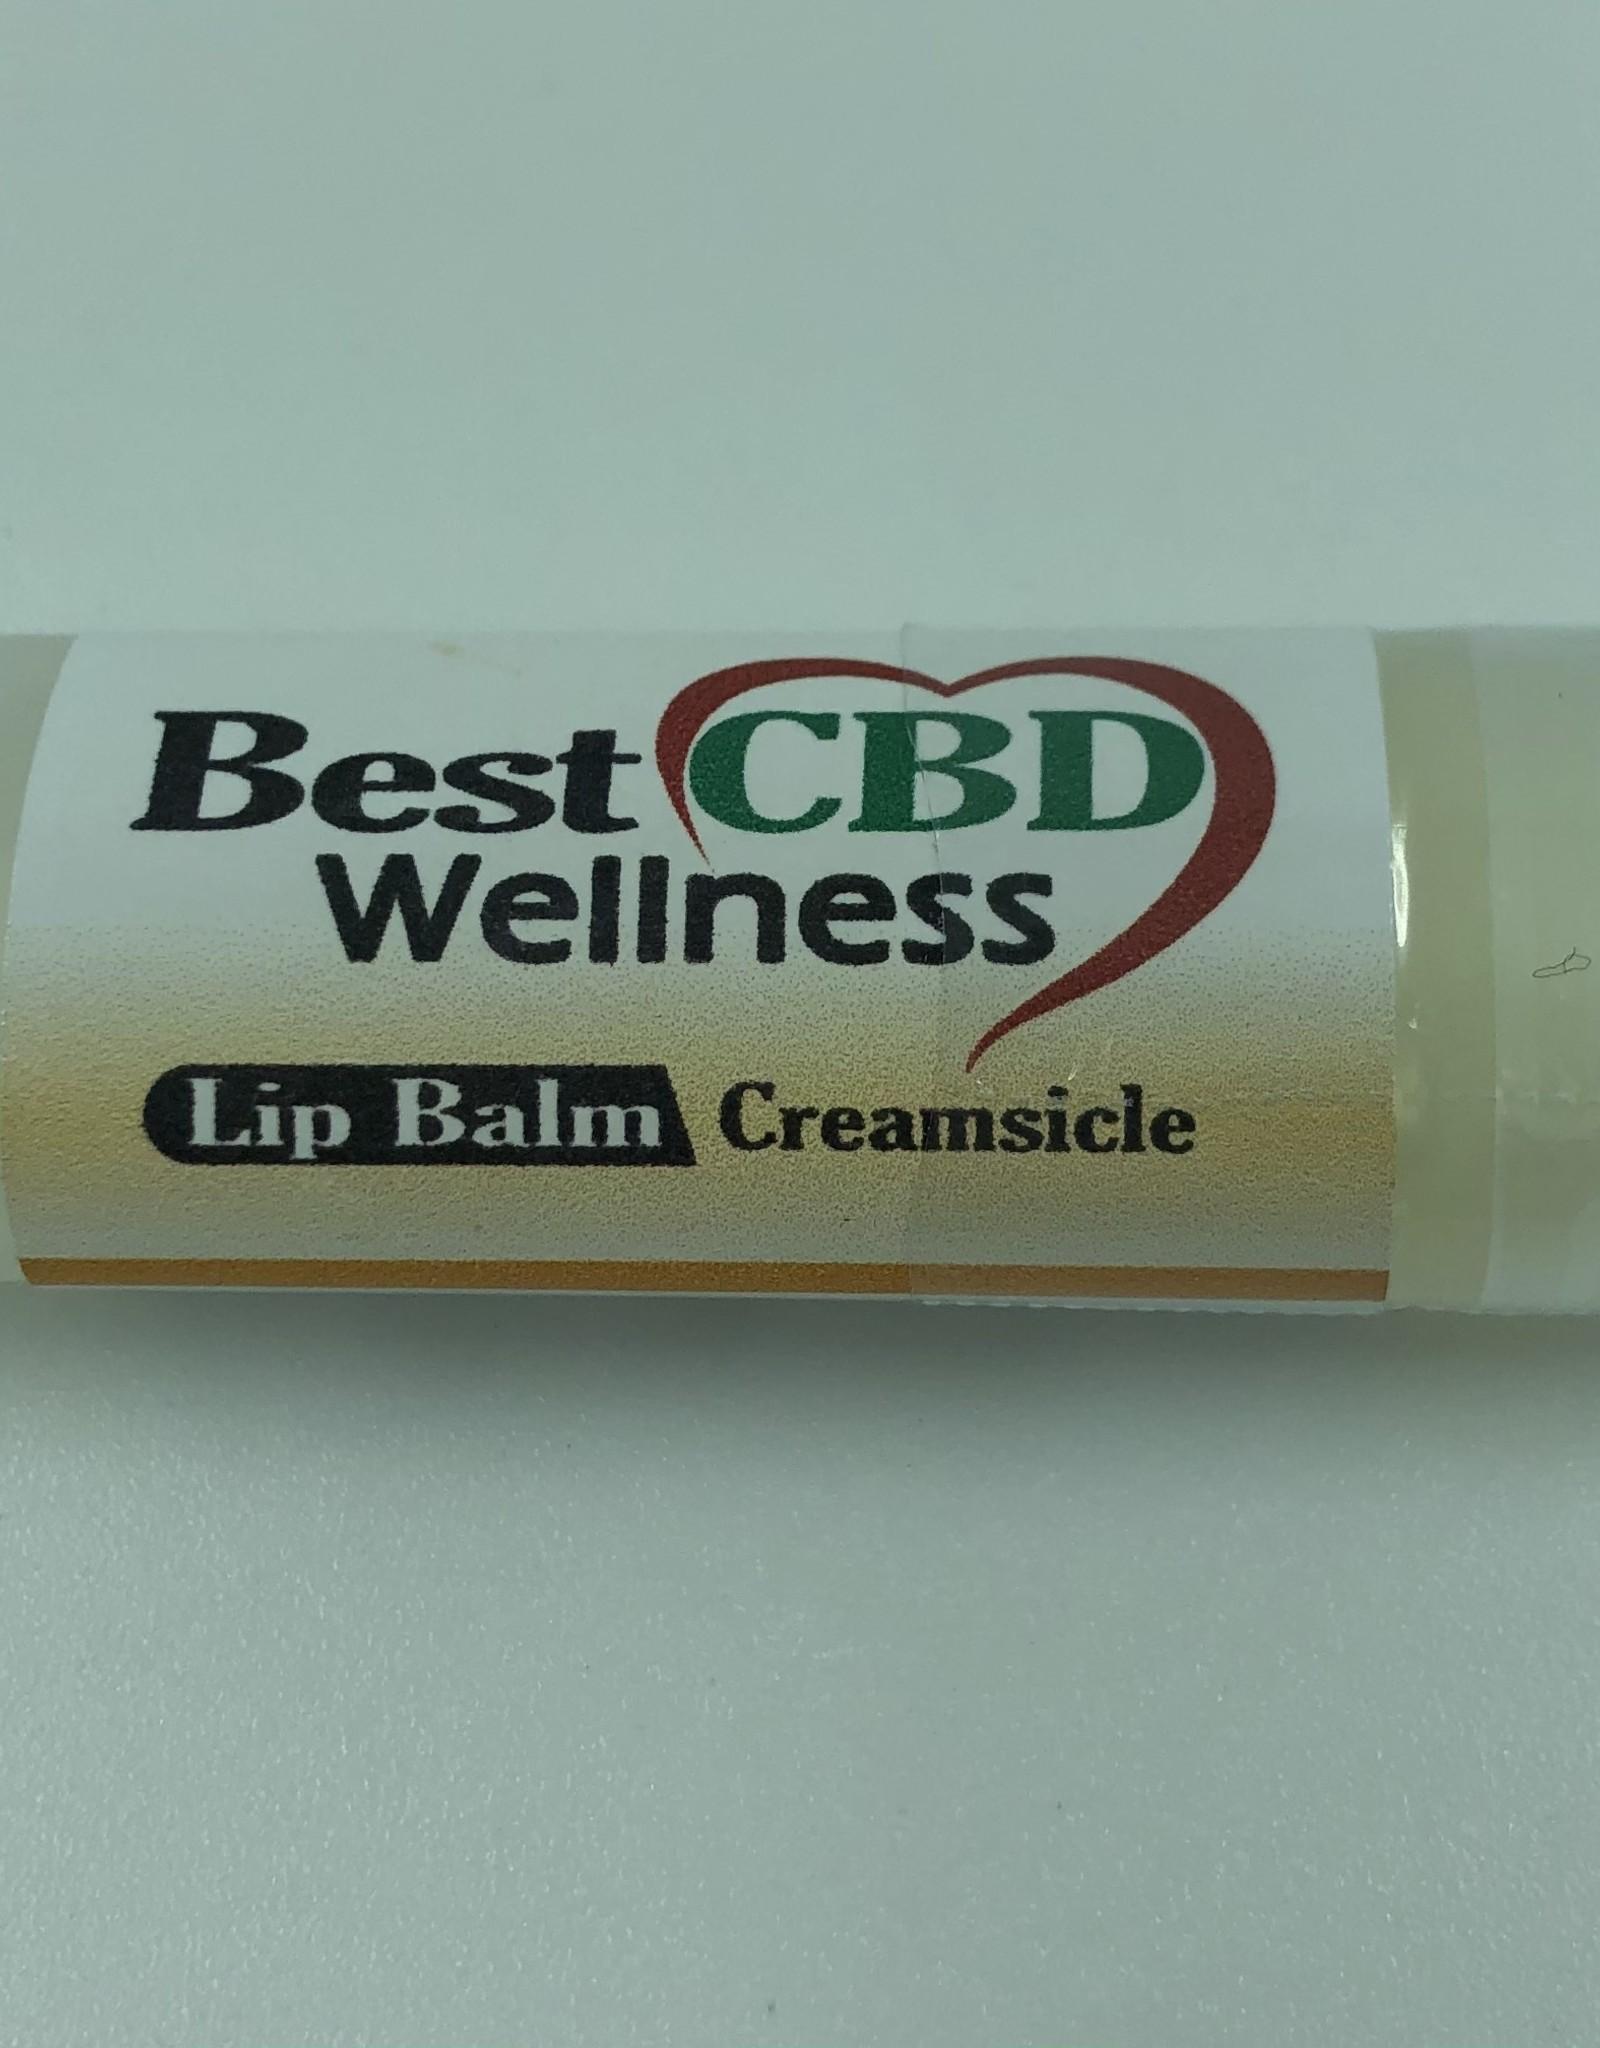 Best CBD Wellness Isolate CBD Creamsicle Lip Balm 50mg